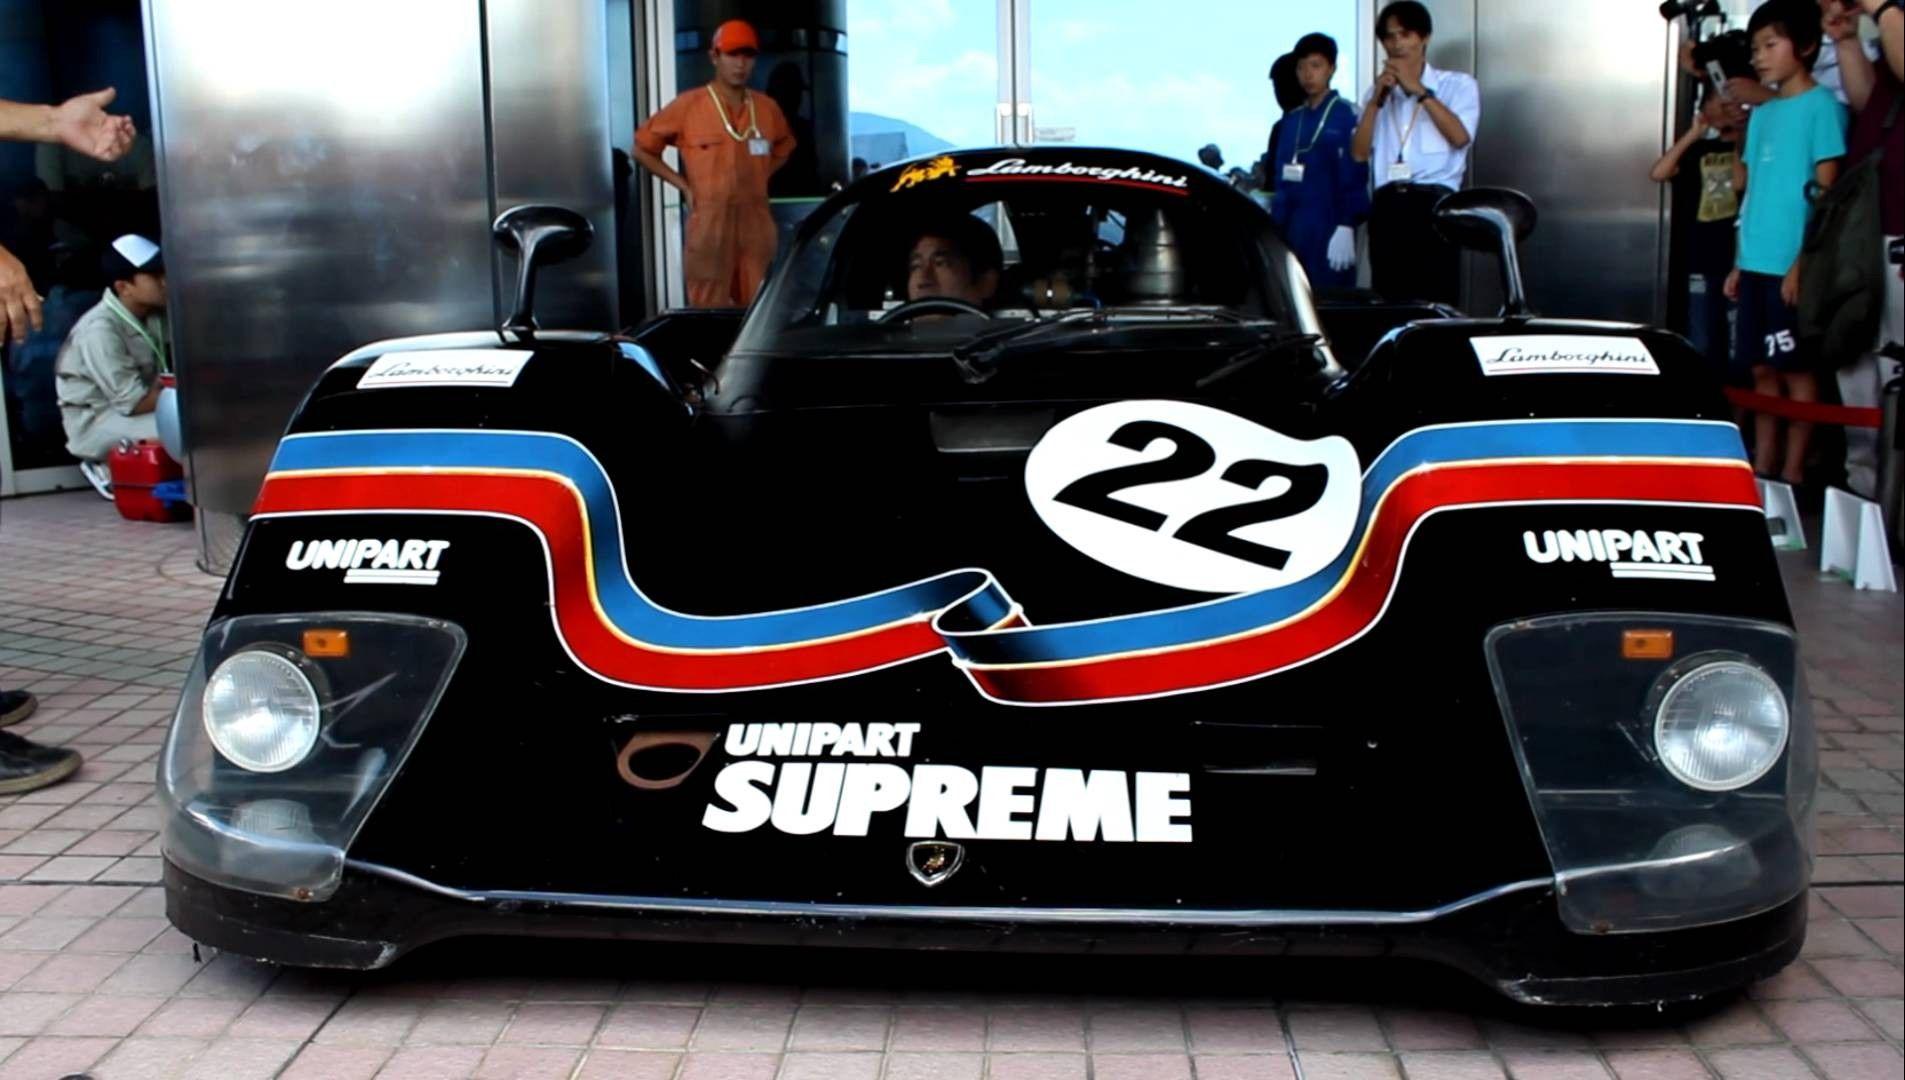 Amazing Enginesound By Countach Qvx Lamborghini Racing